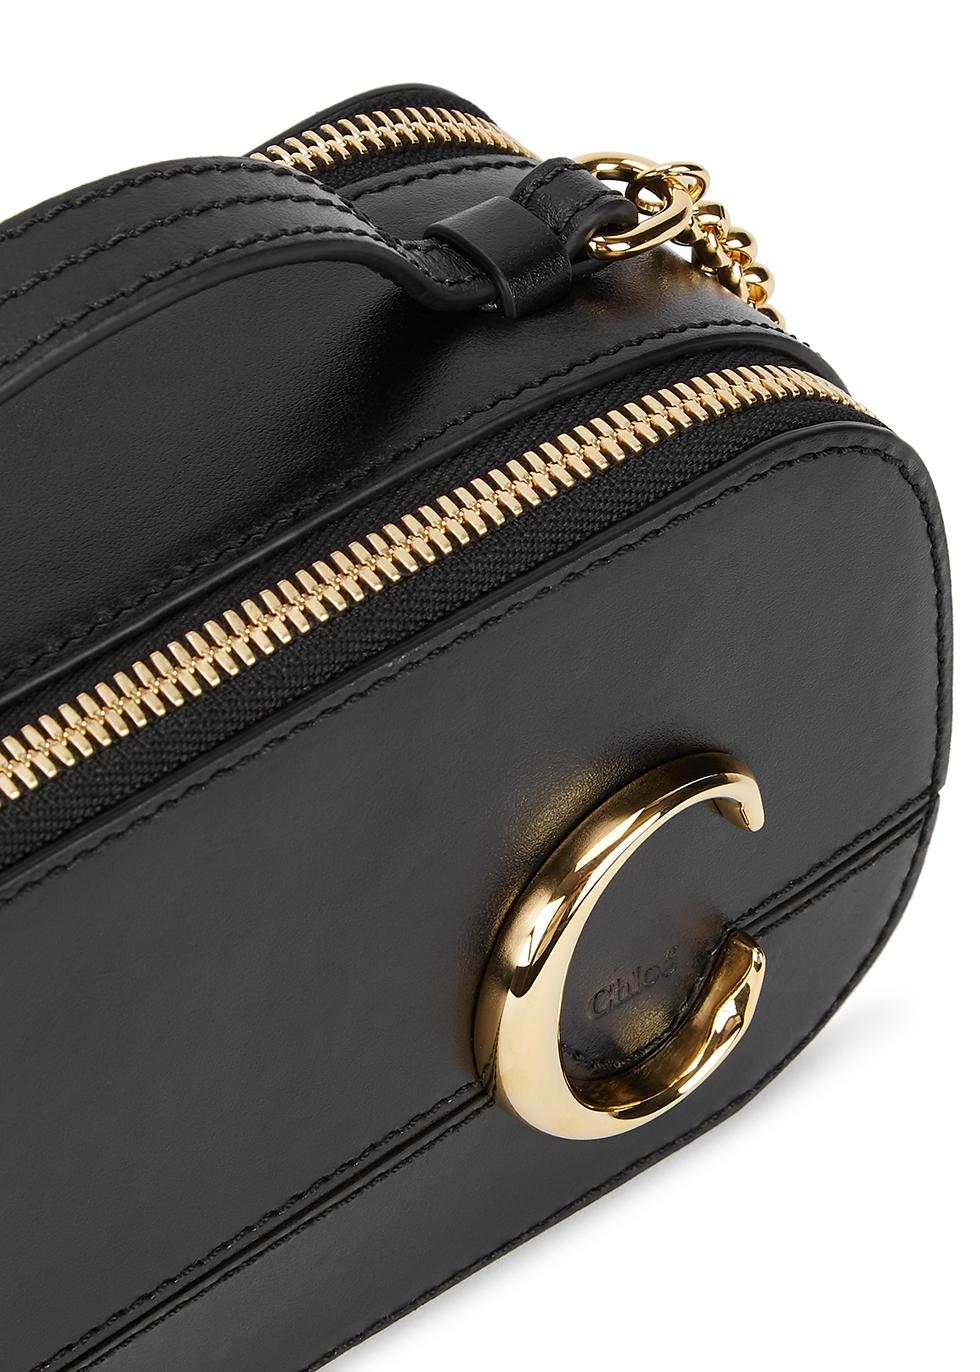 Chloé Chloé C Vanity mini leather cross body bag Harvey